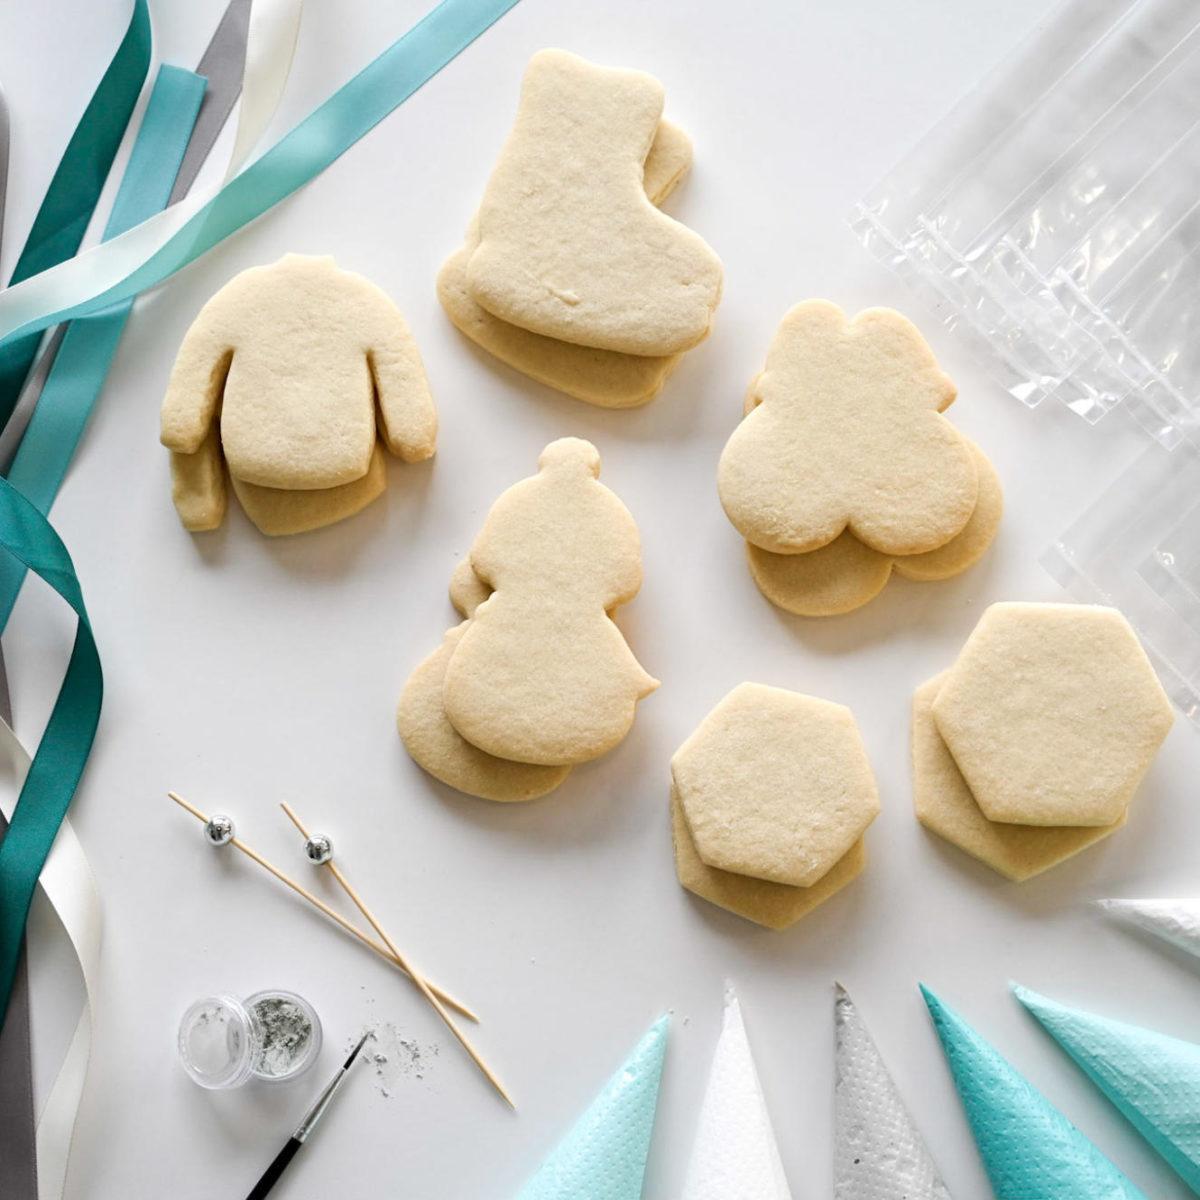 Luxe DIY Winter Cookie Kit